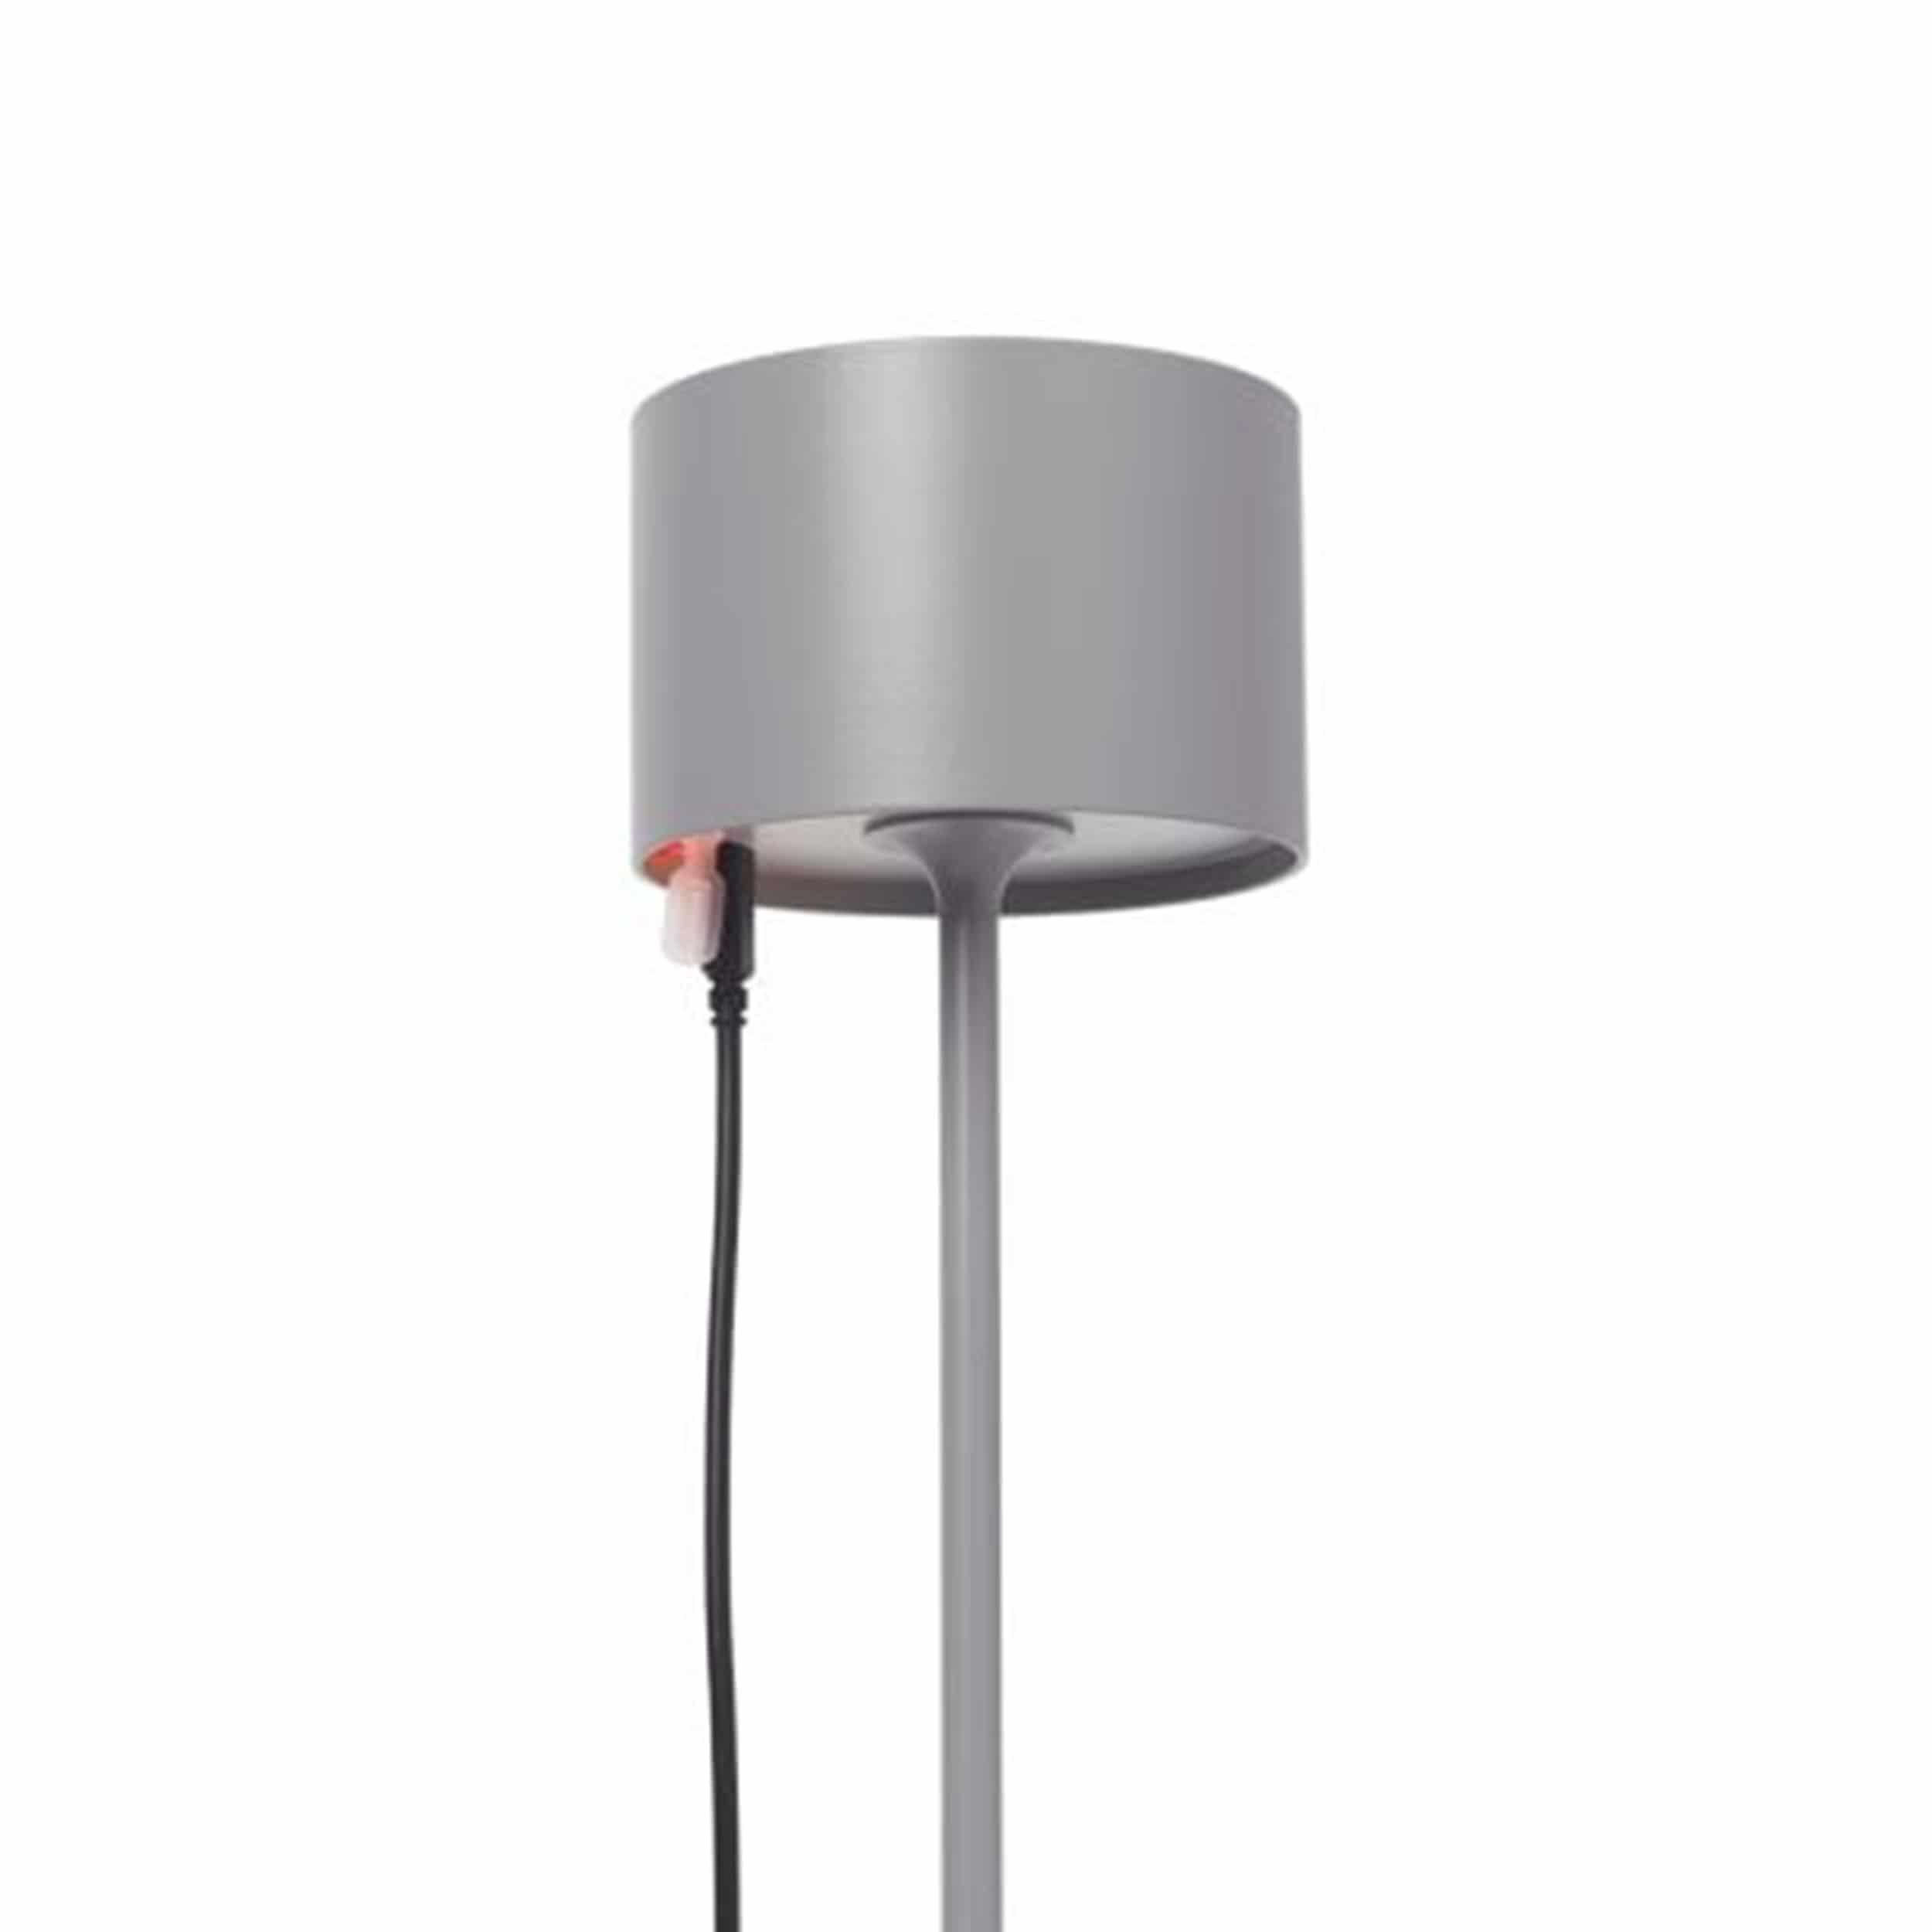 Farol Mobile LED Tischleuchte